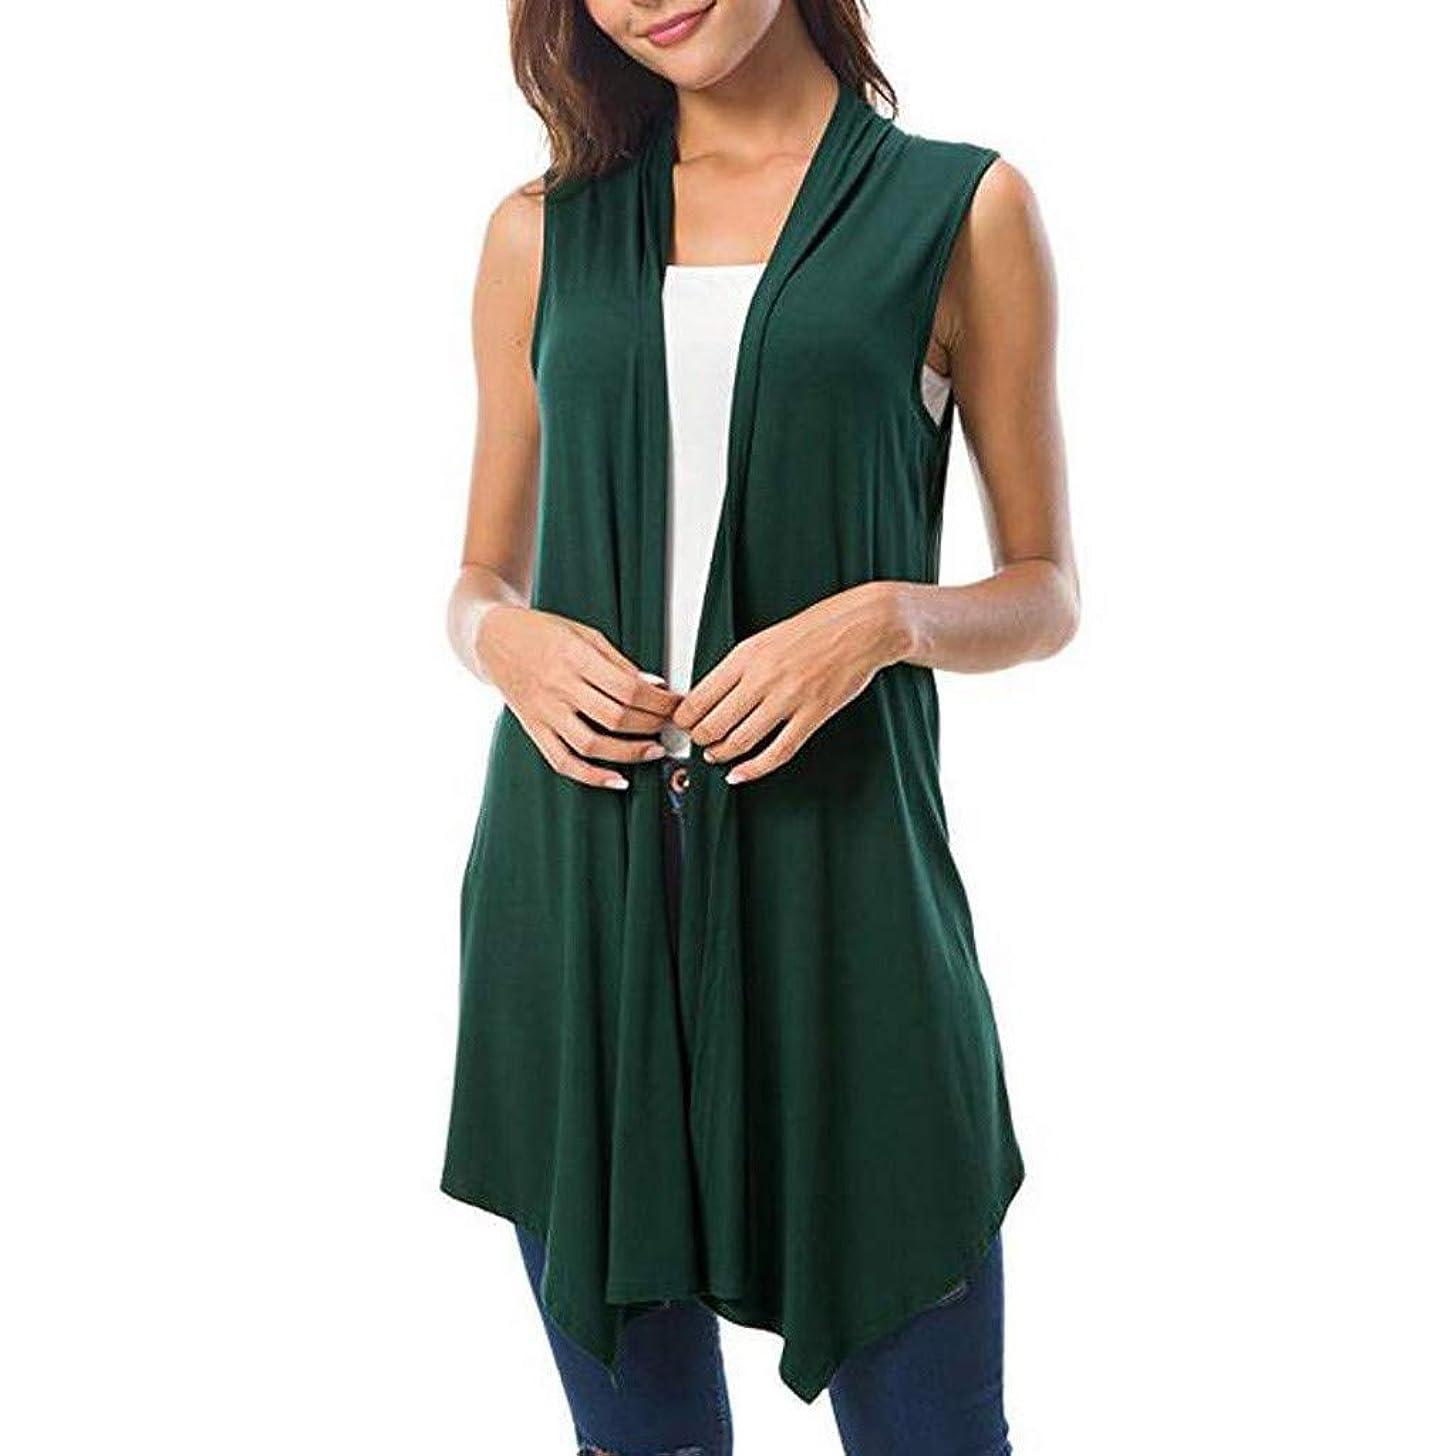 〓COOlCCI〓Women's Sleeveless Draped Open Front Cardigan Vest Asymmetric Hem,Cardigan Lightweight Draped Layering Vest